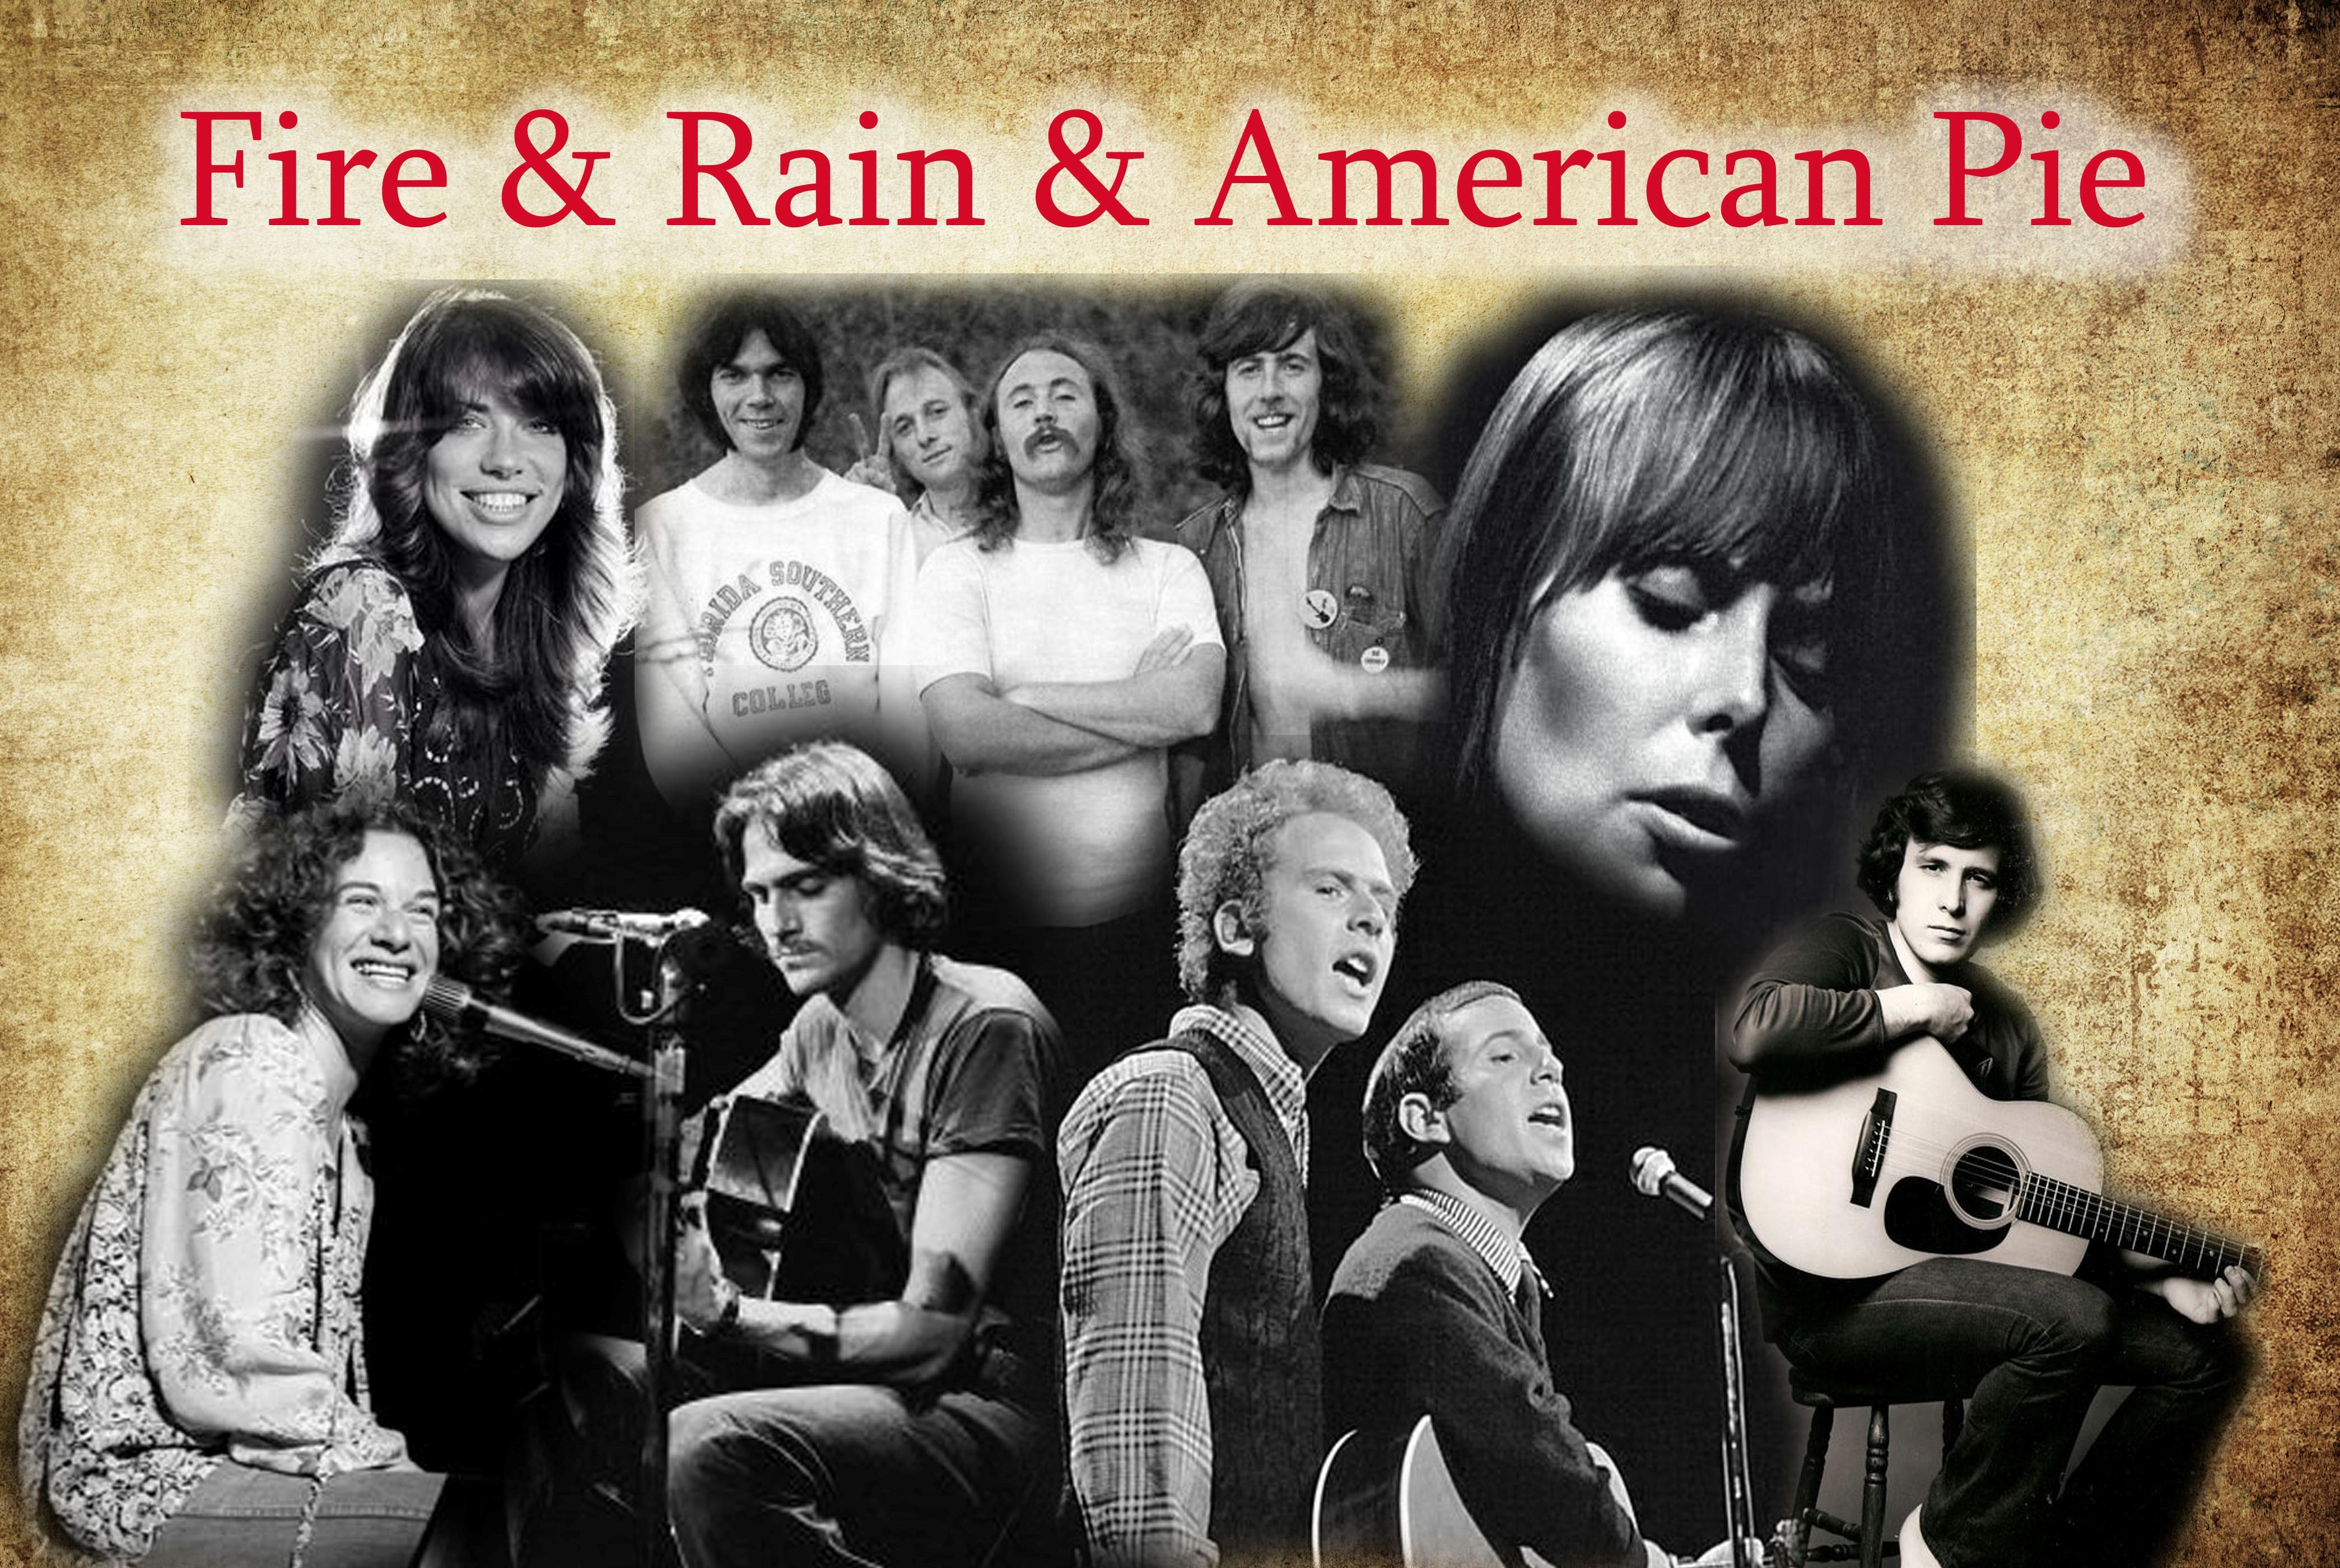 Fire and Rain & American Pie